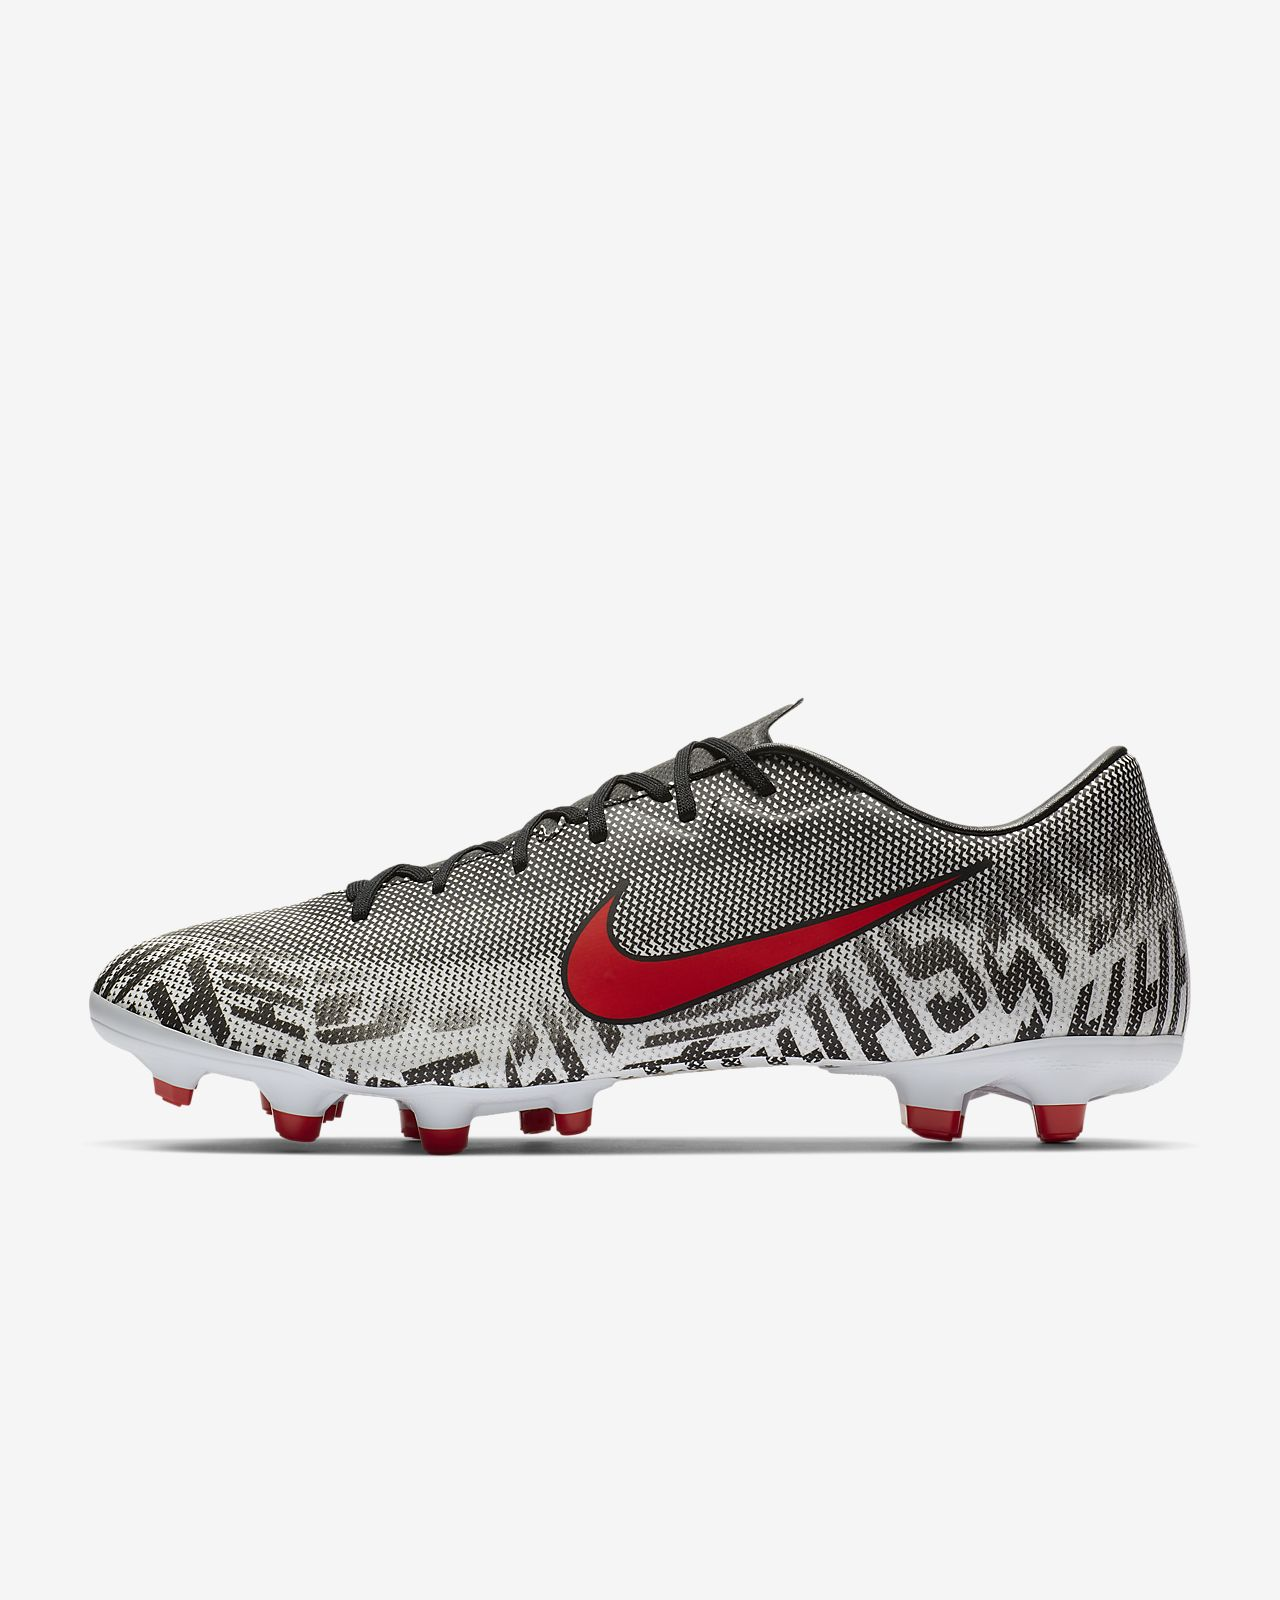 NikeVapor 12 Academy NJR FG/MG男/女多种场地足球鞋